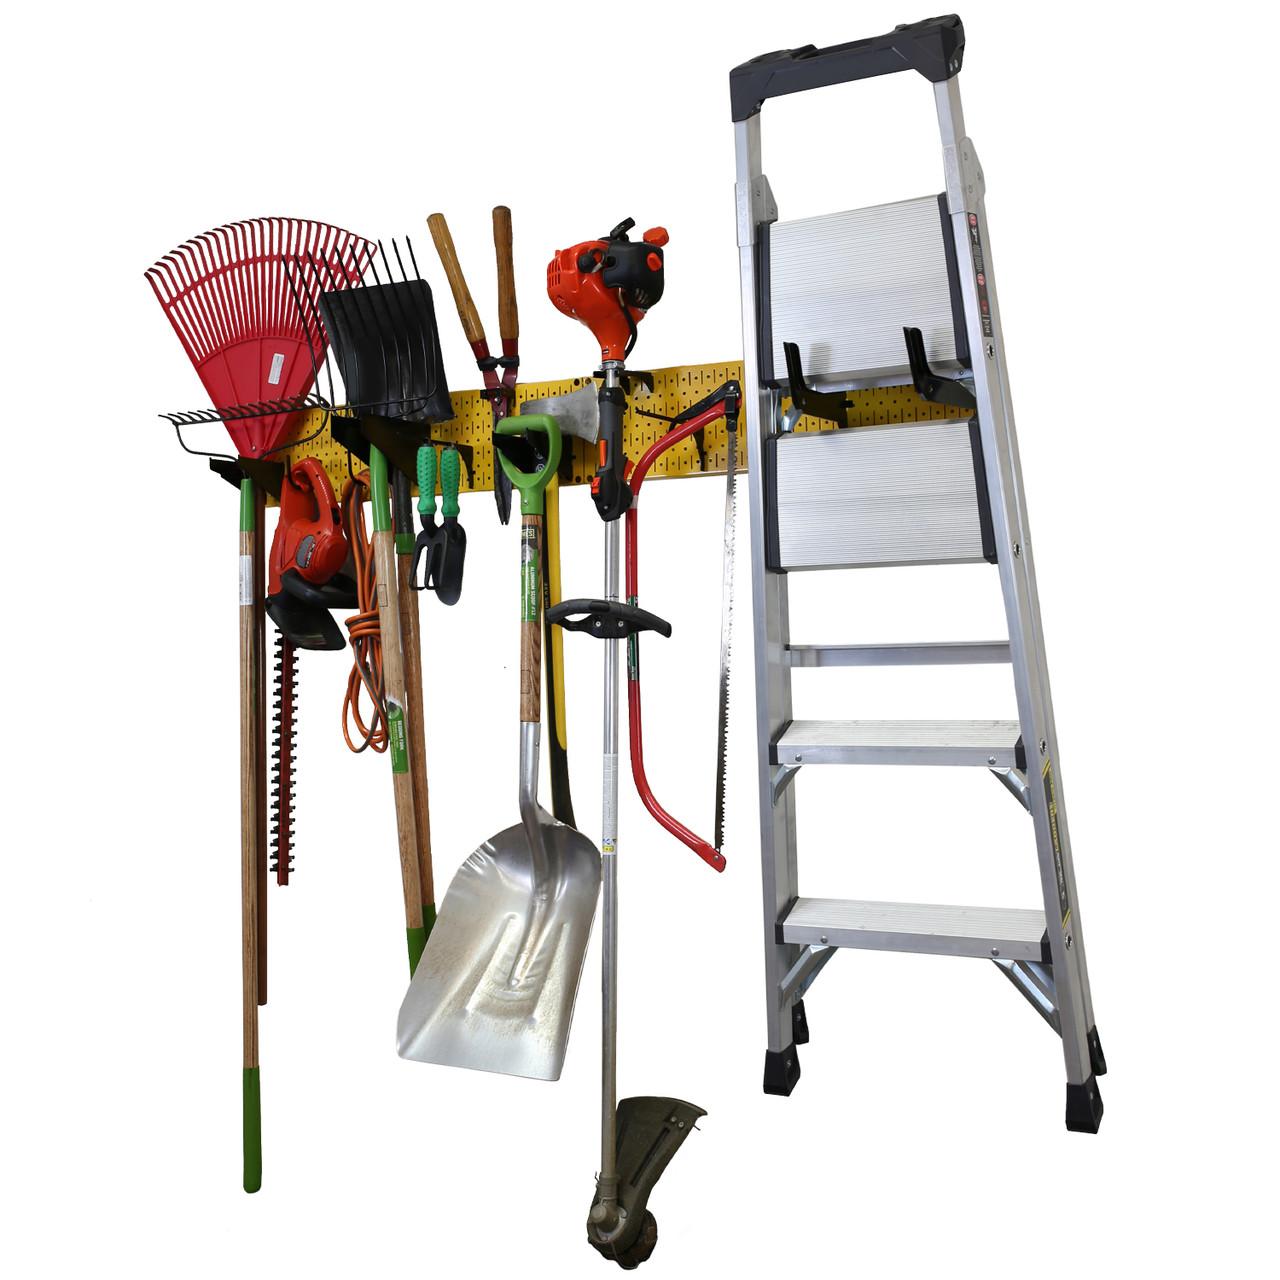 4 Pack Pegboard Baskets Organize Tools Shelf Storage Box Steel Garage Wall